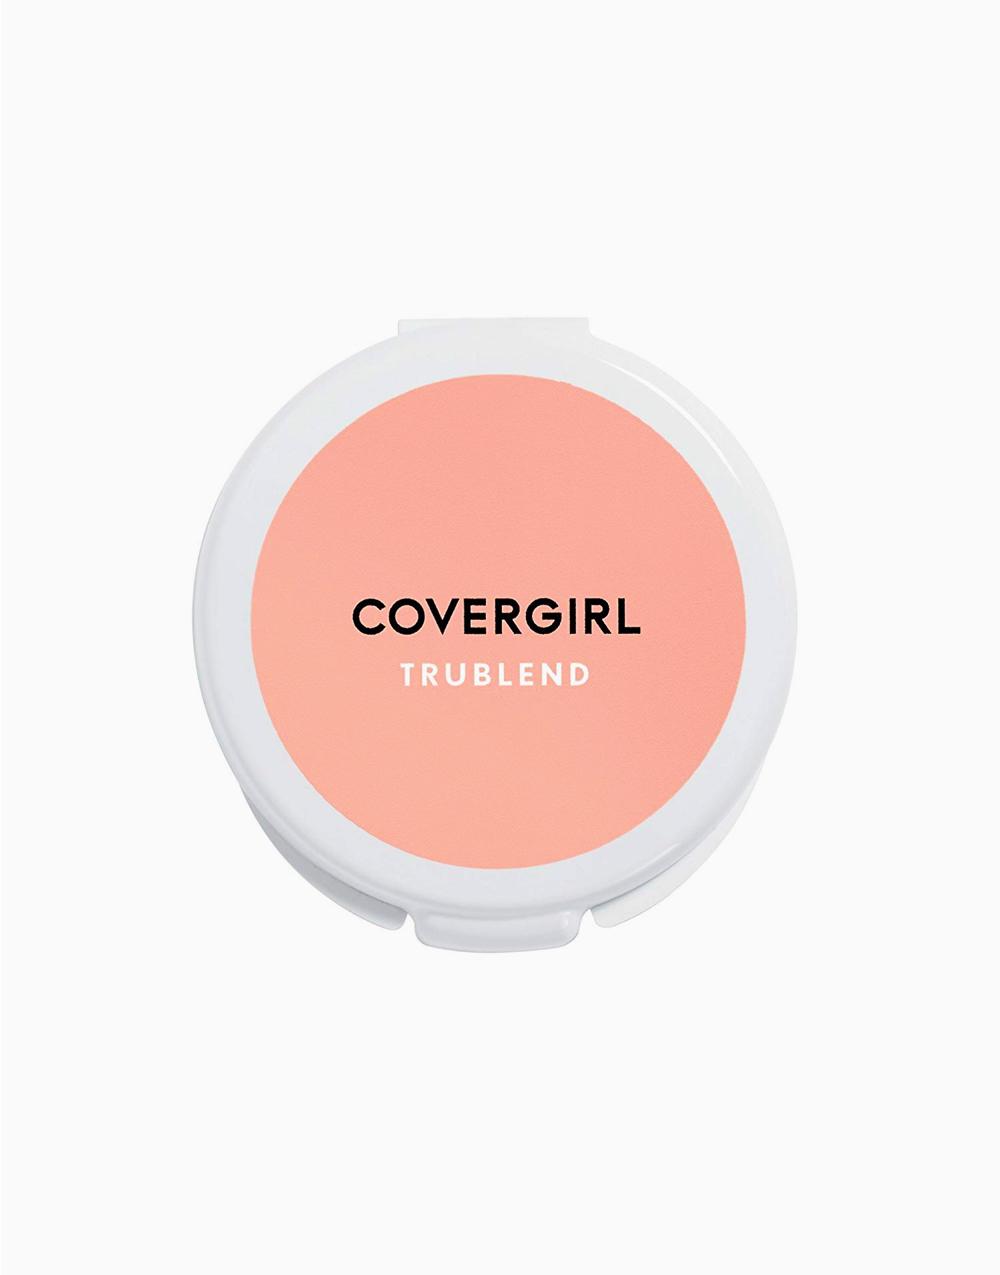 TruBlend Translucent Pressed Powder by CoverGirl | Translucent Light